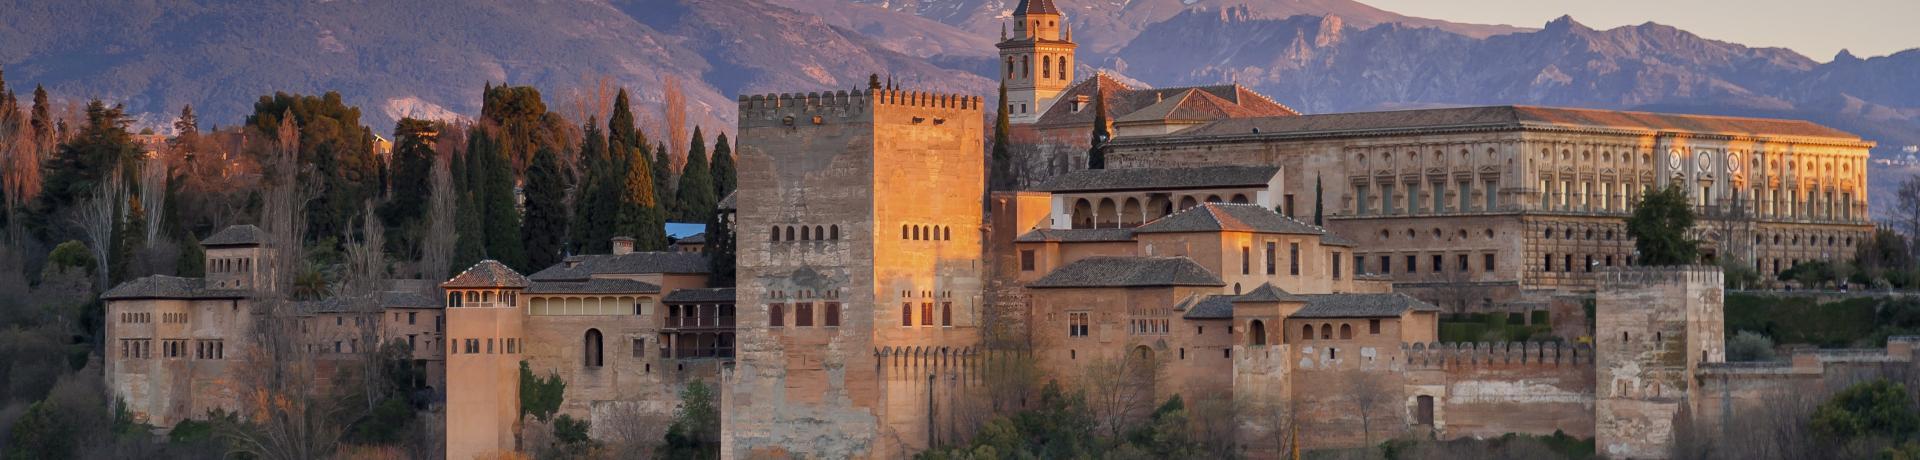 1005+Spanien+Andalusien+Granada+TS_507330309.jpg